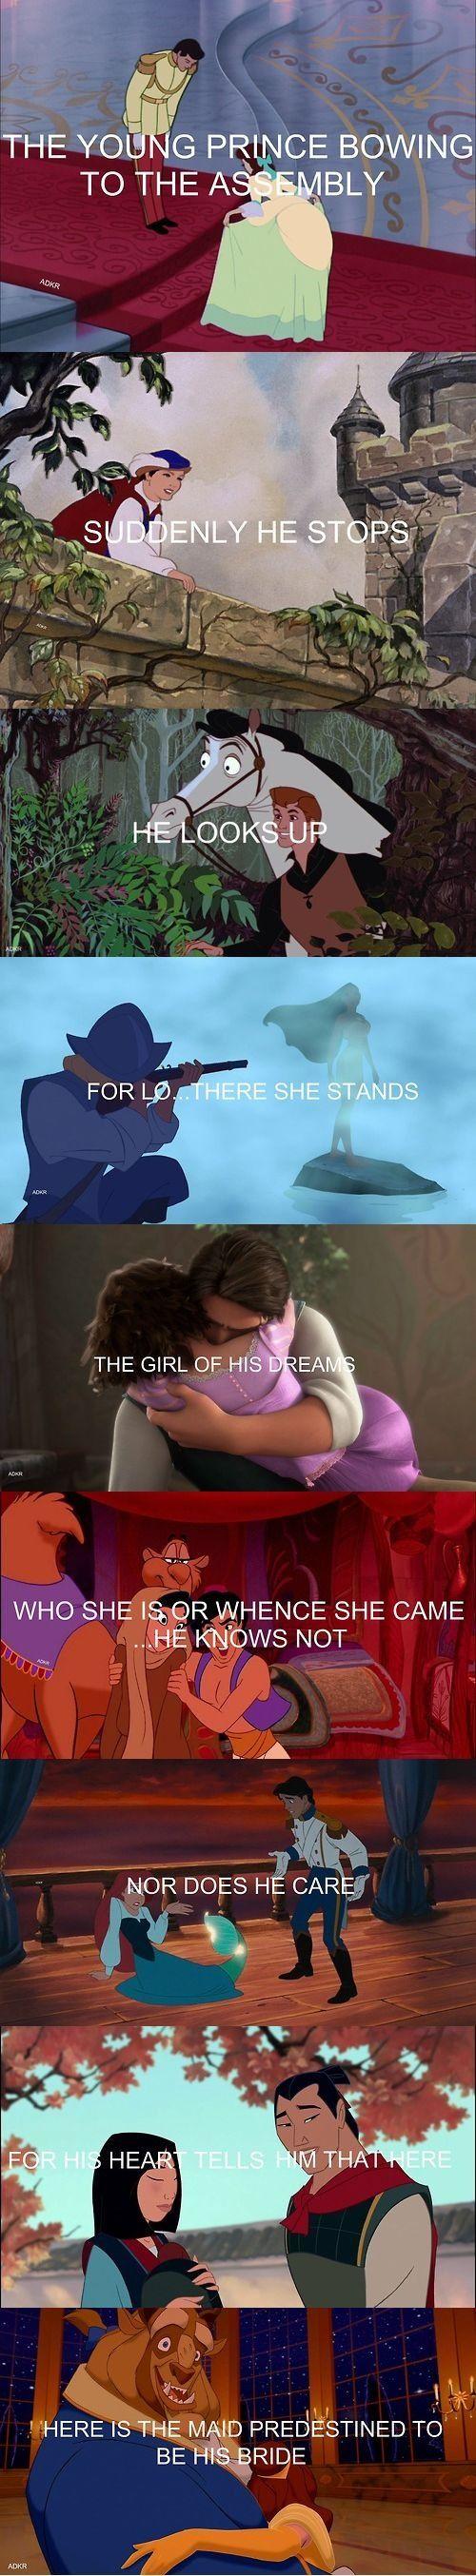 Disney Princes -isn't this a line from Anastasia? Regardless, I love it!